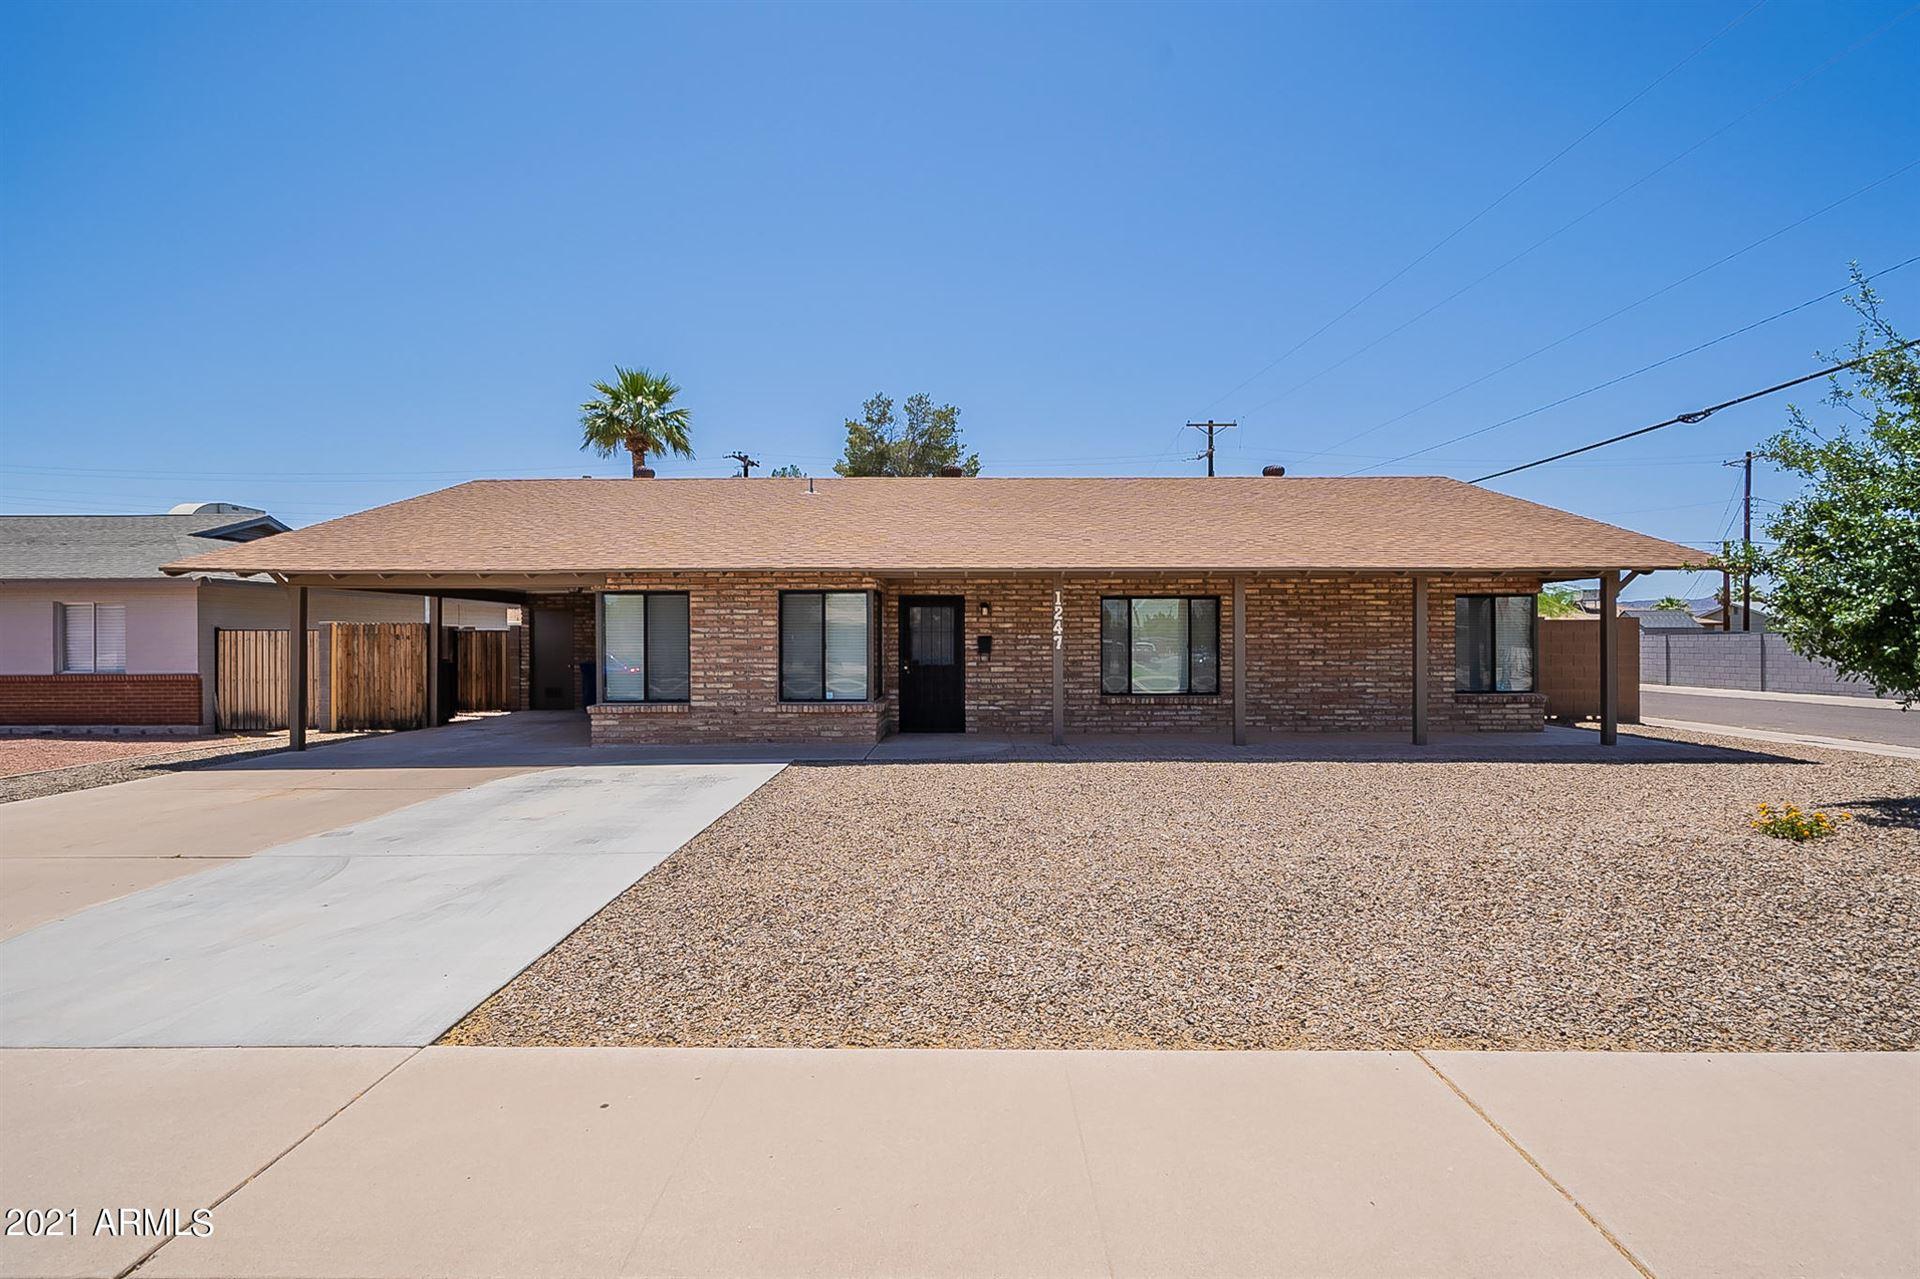 Photo of 1247 W 10TH Street, Tempe, AZ 85281 (MLS # 6234168)